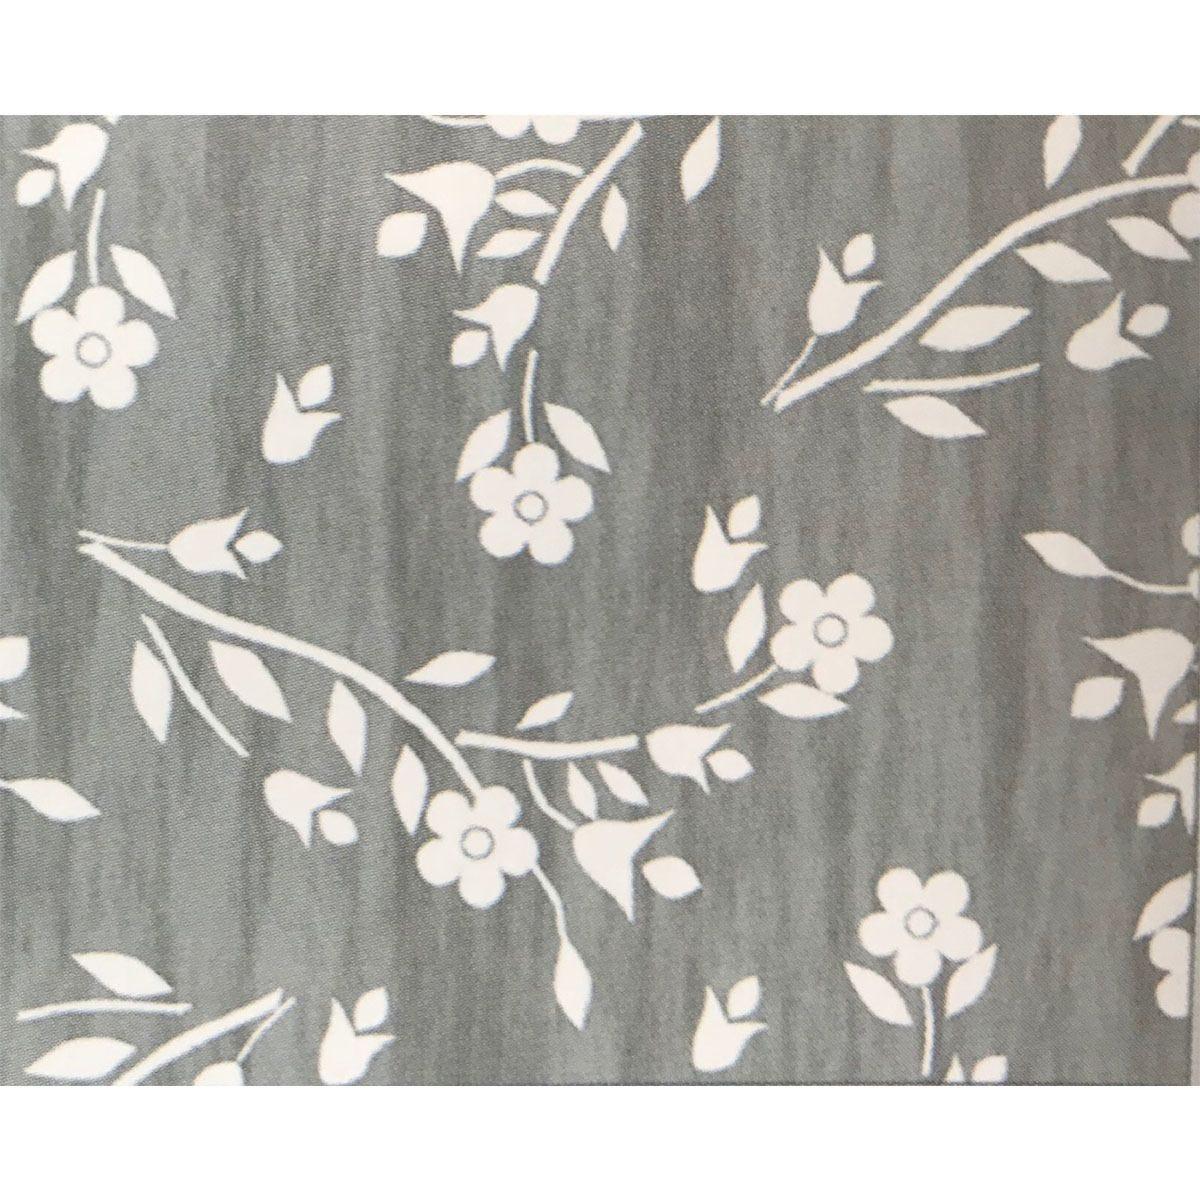 Le Chateau Floral Spring PVC Tablecloth - Grey